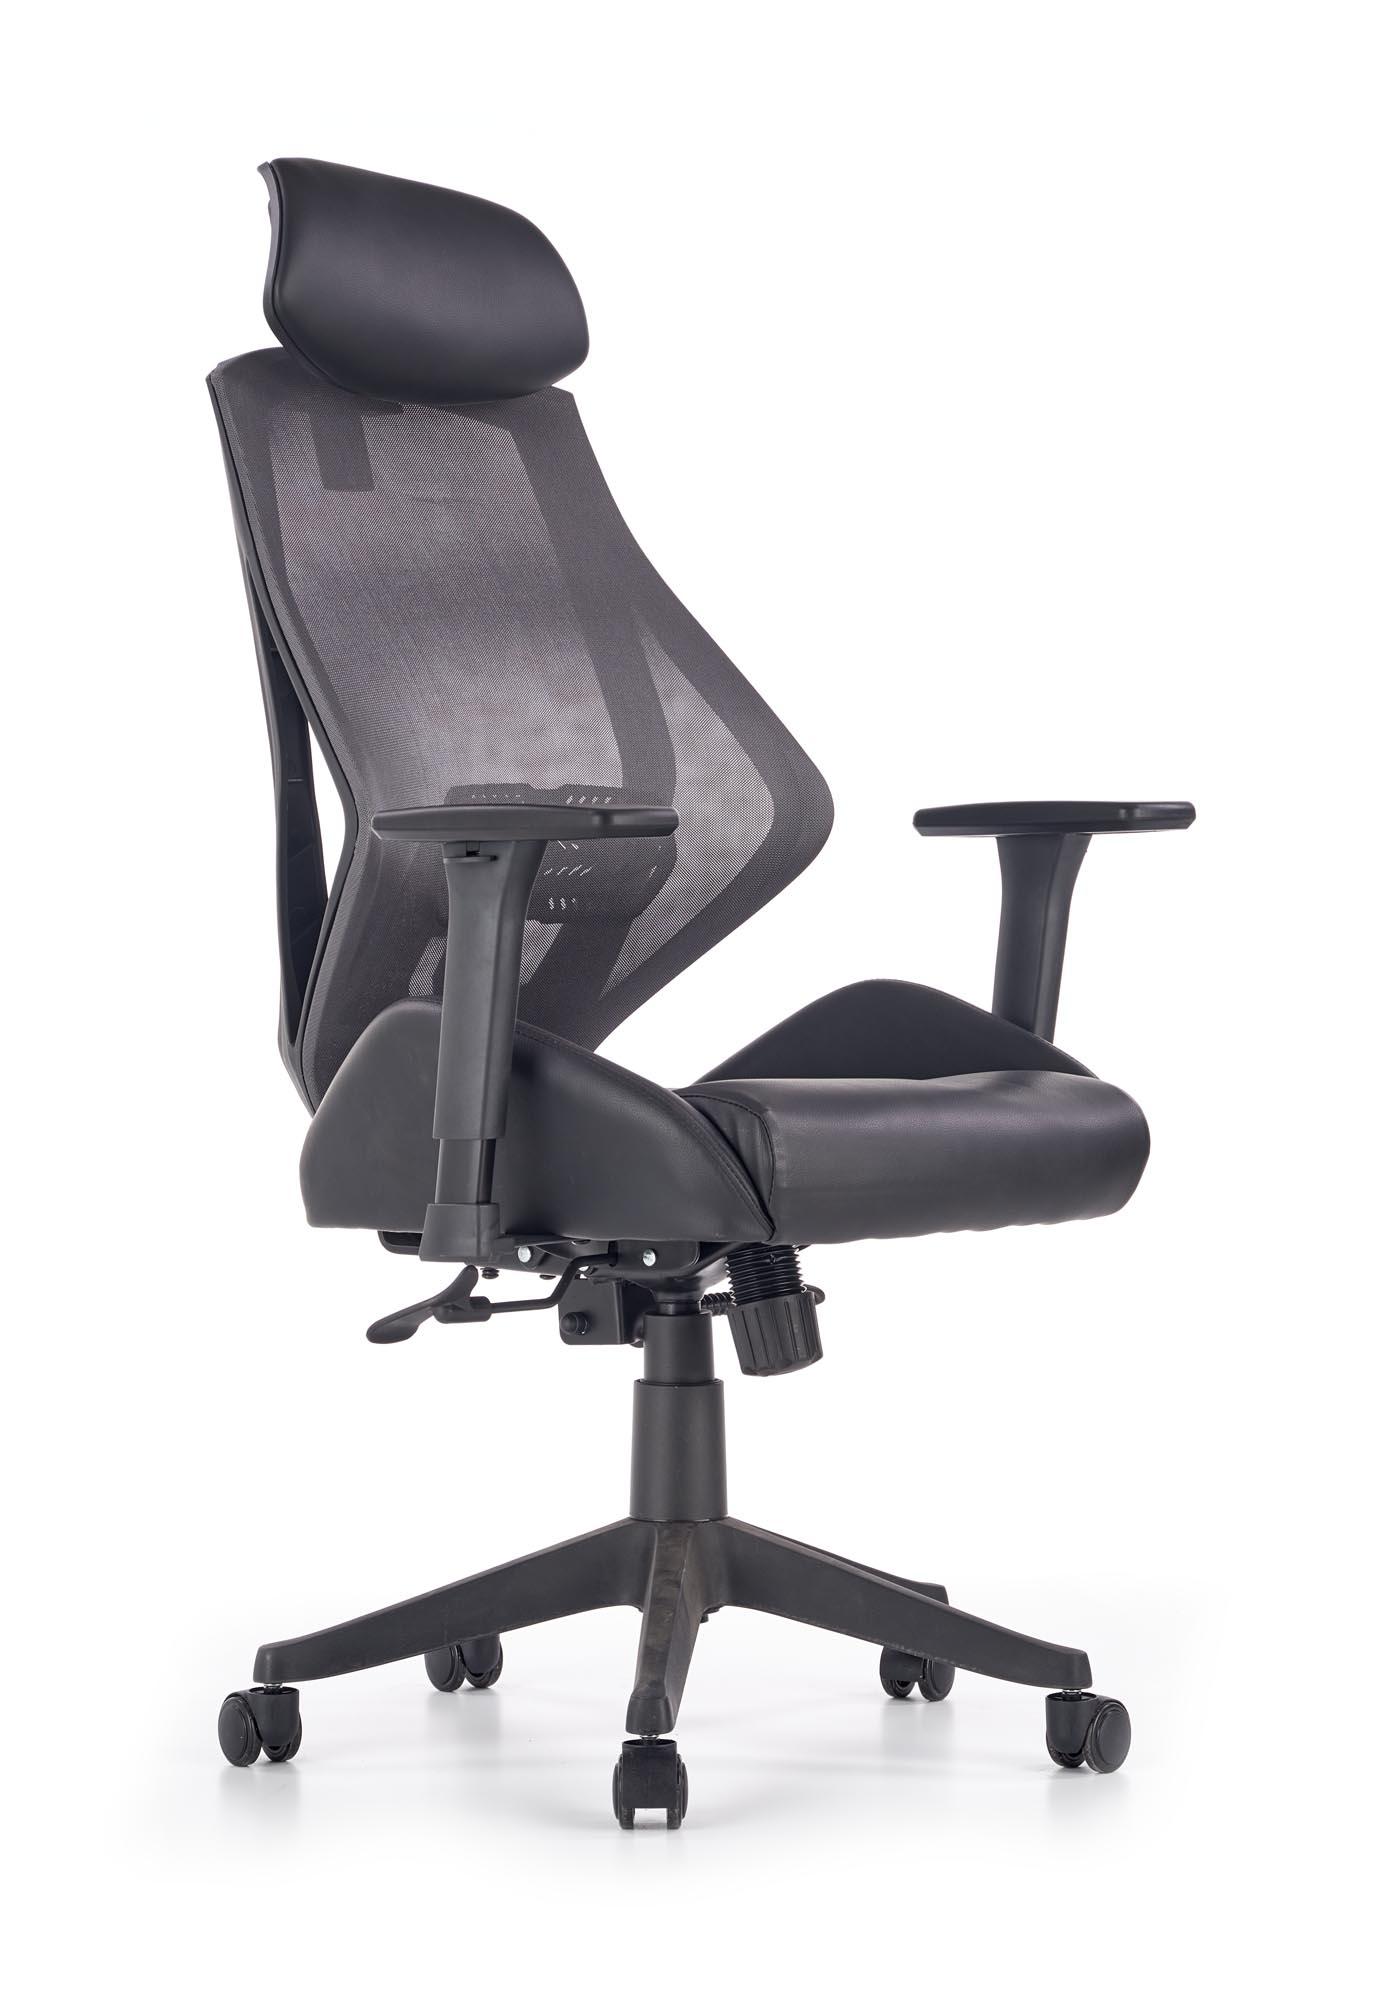 Scaun de birou ergonomic, tapitat cu piele ecologica Hasel Negru / Gri, l68xA78xH110-118 cm imagine